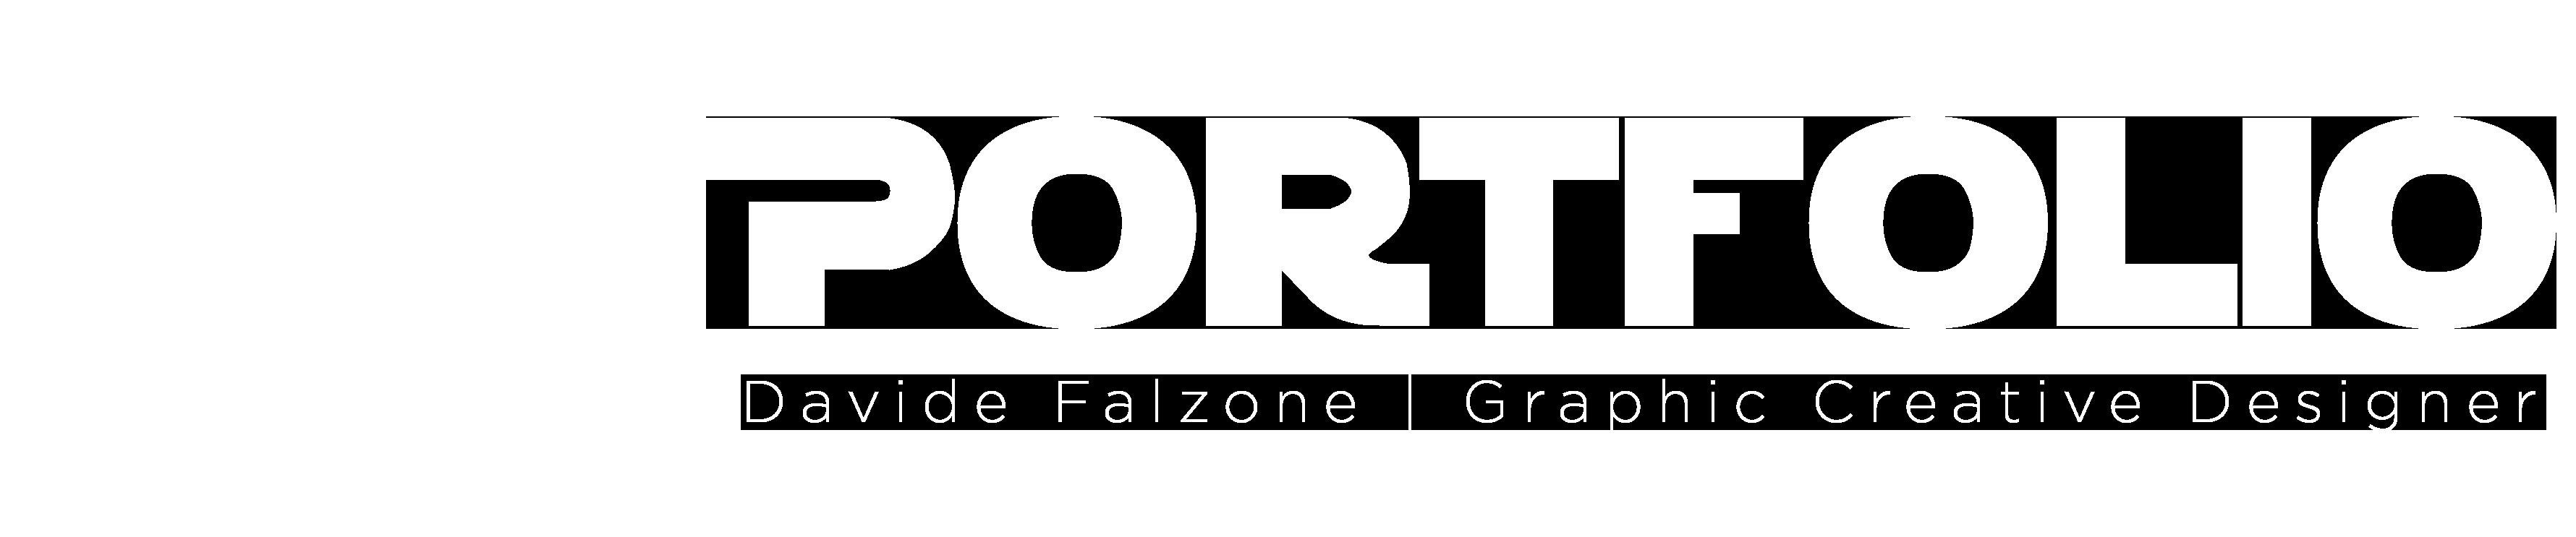 Davide Falzone - Portfolio